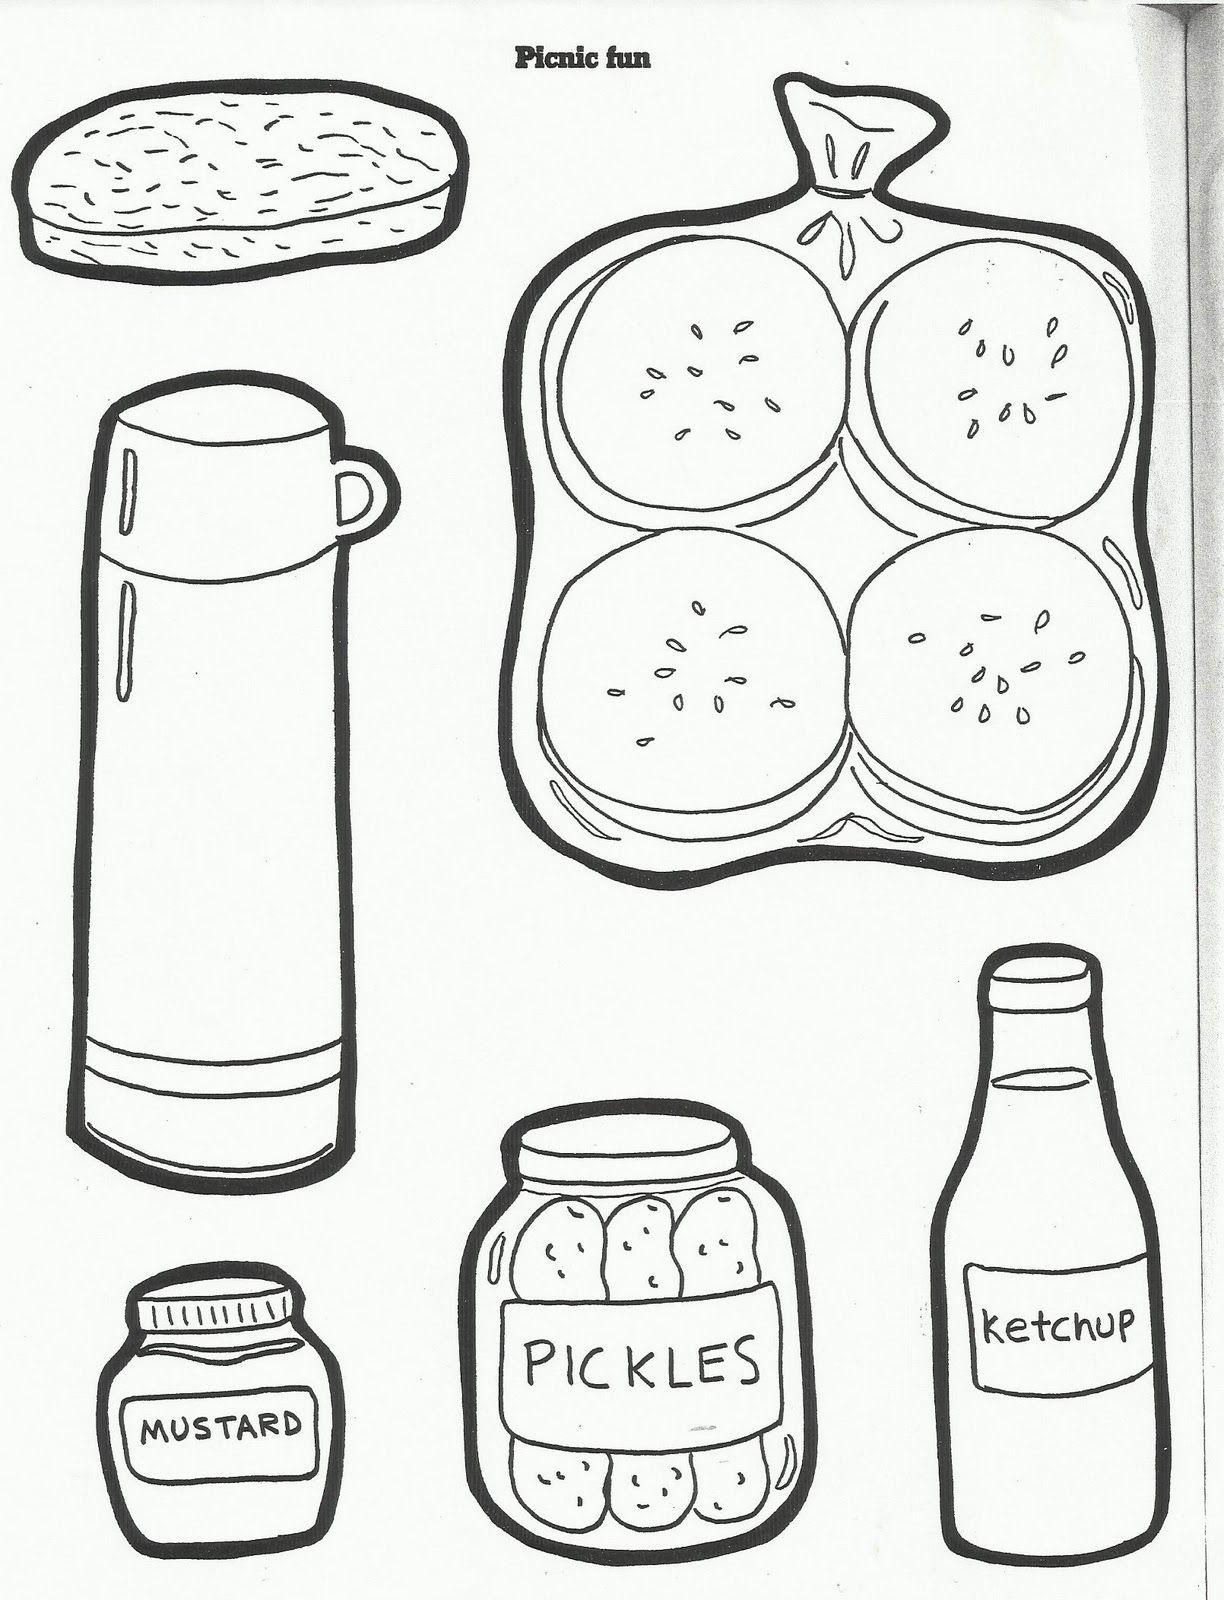 Squish Prosxolikh Idees Trofima Didaskei Diatrofh Kai Kales Diatrofikes Synh8eies Healthy Habits Preschool Food Themes Healthy Appetizers Easy